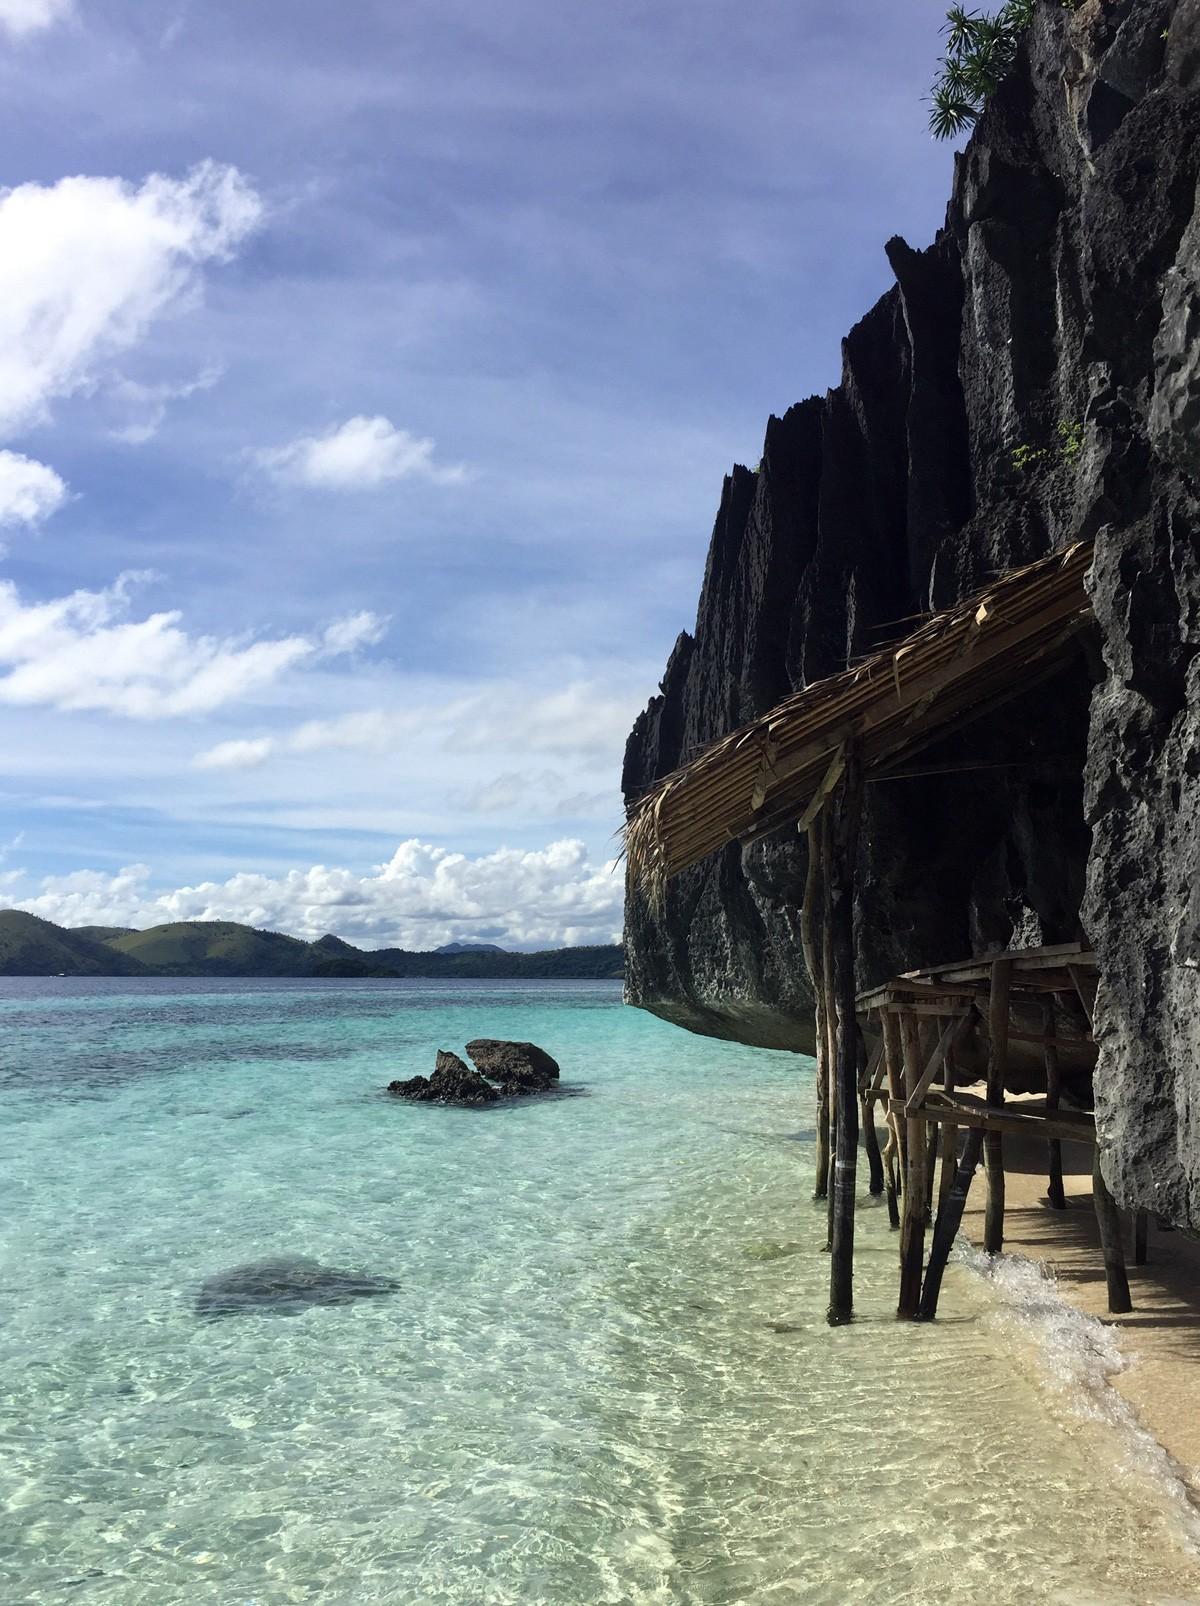 Clean water and perfect view - Banol beach, Palawan